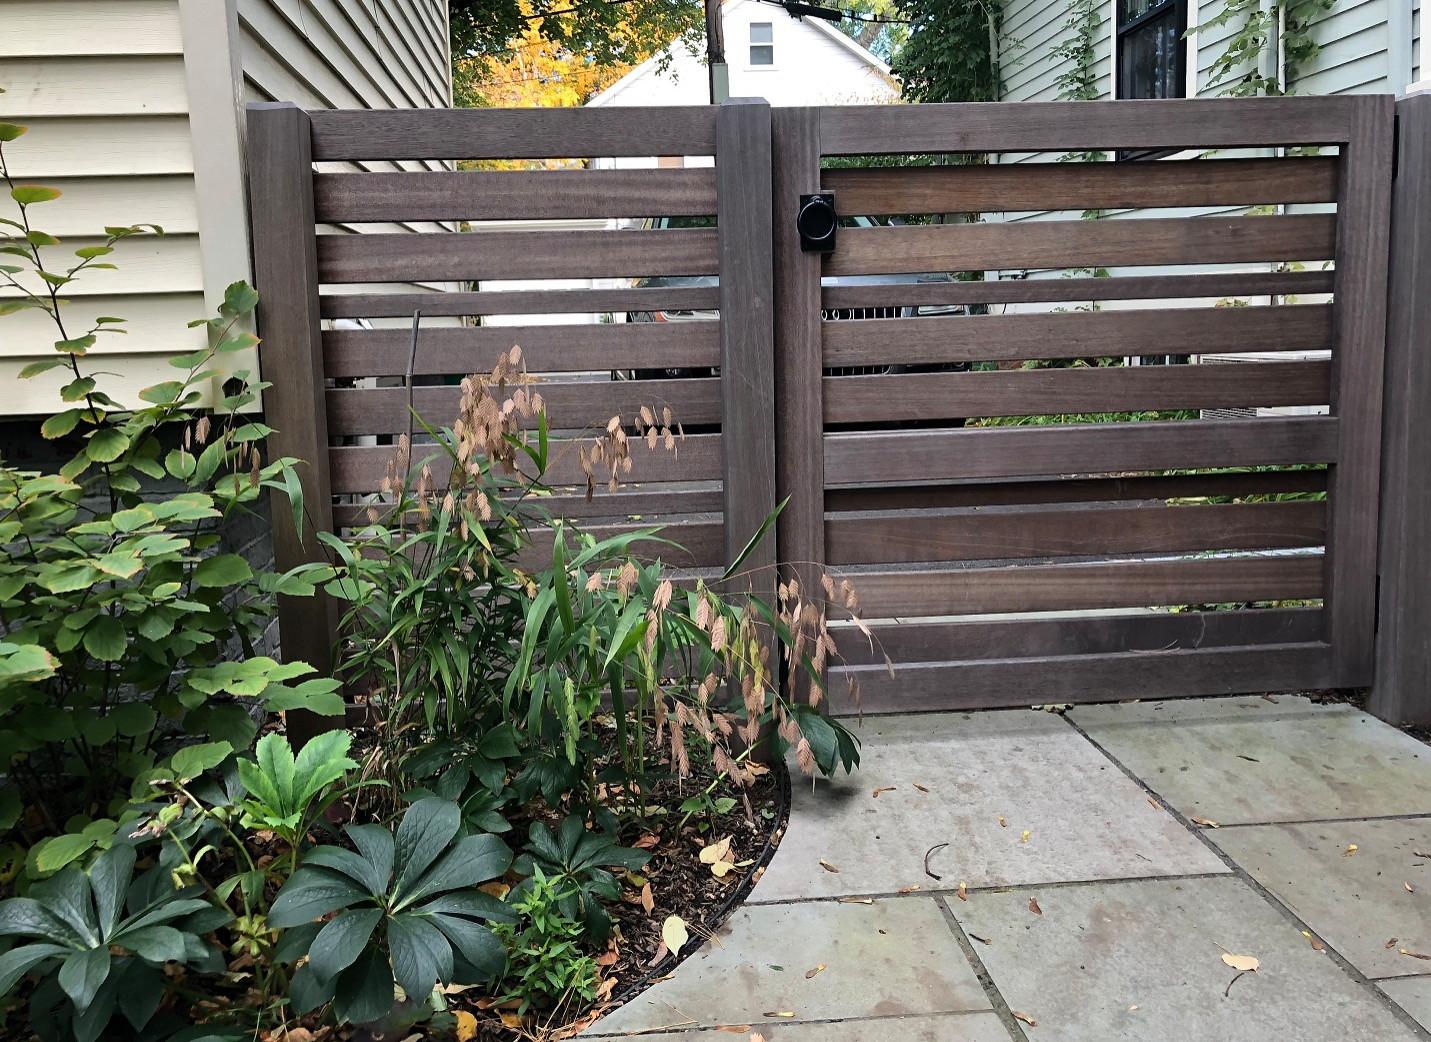 Mahogany garden gate separates driveway from garden